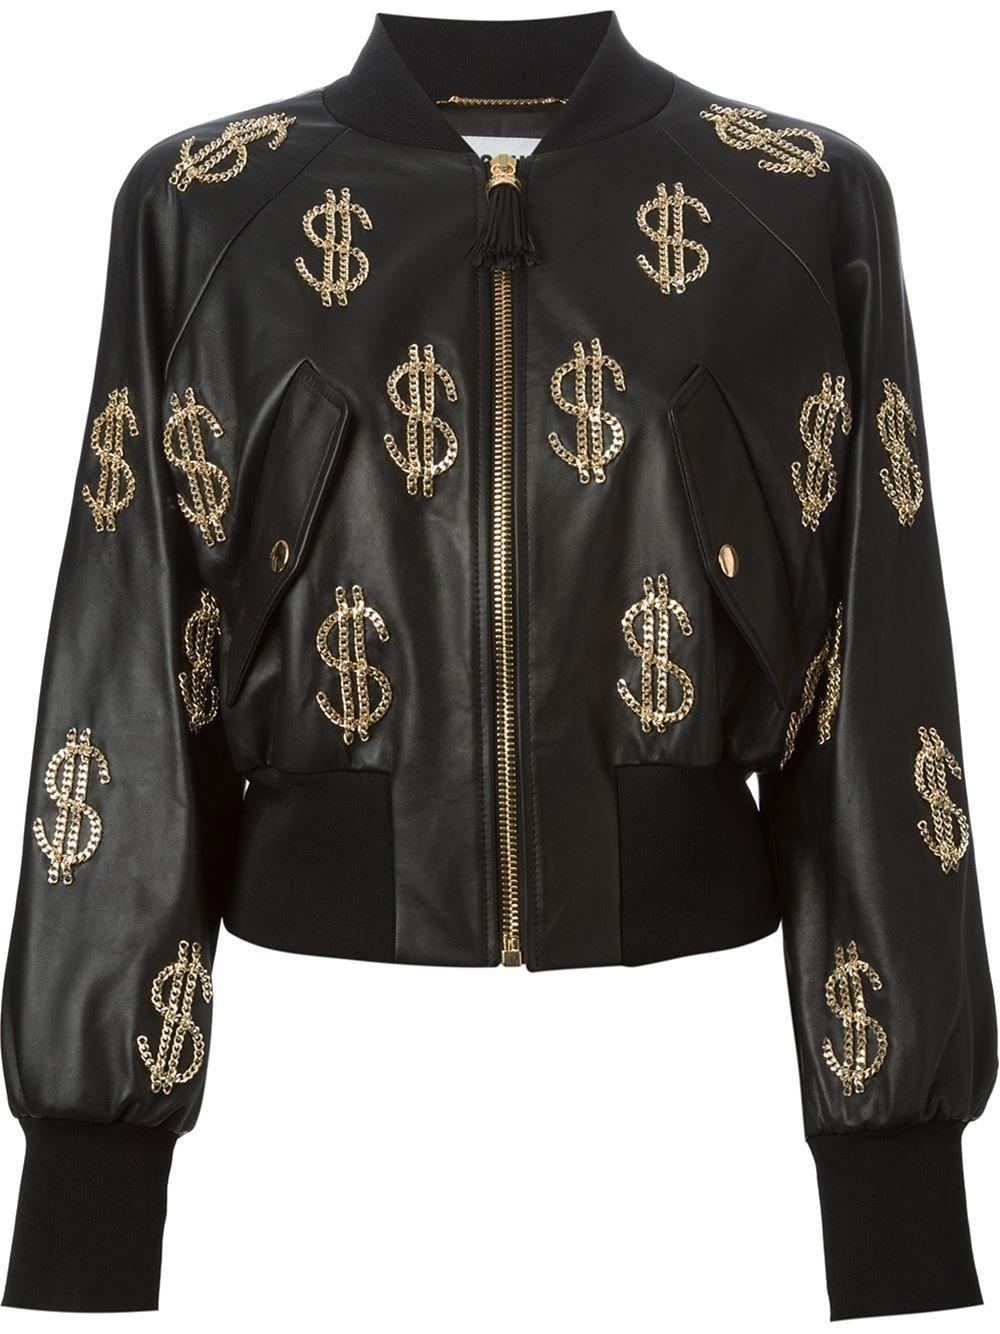 227d3f0a74 Moschino Chain Dollar Sign Bomber Jacket - Stefania Mode - Farfetch ...